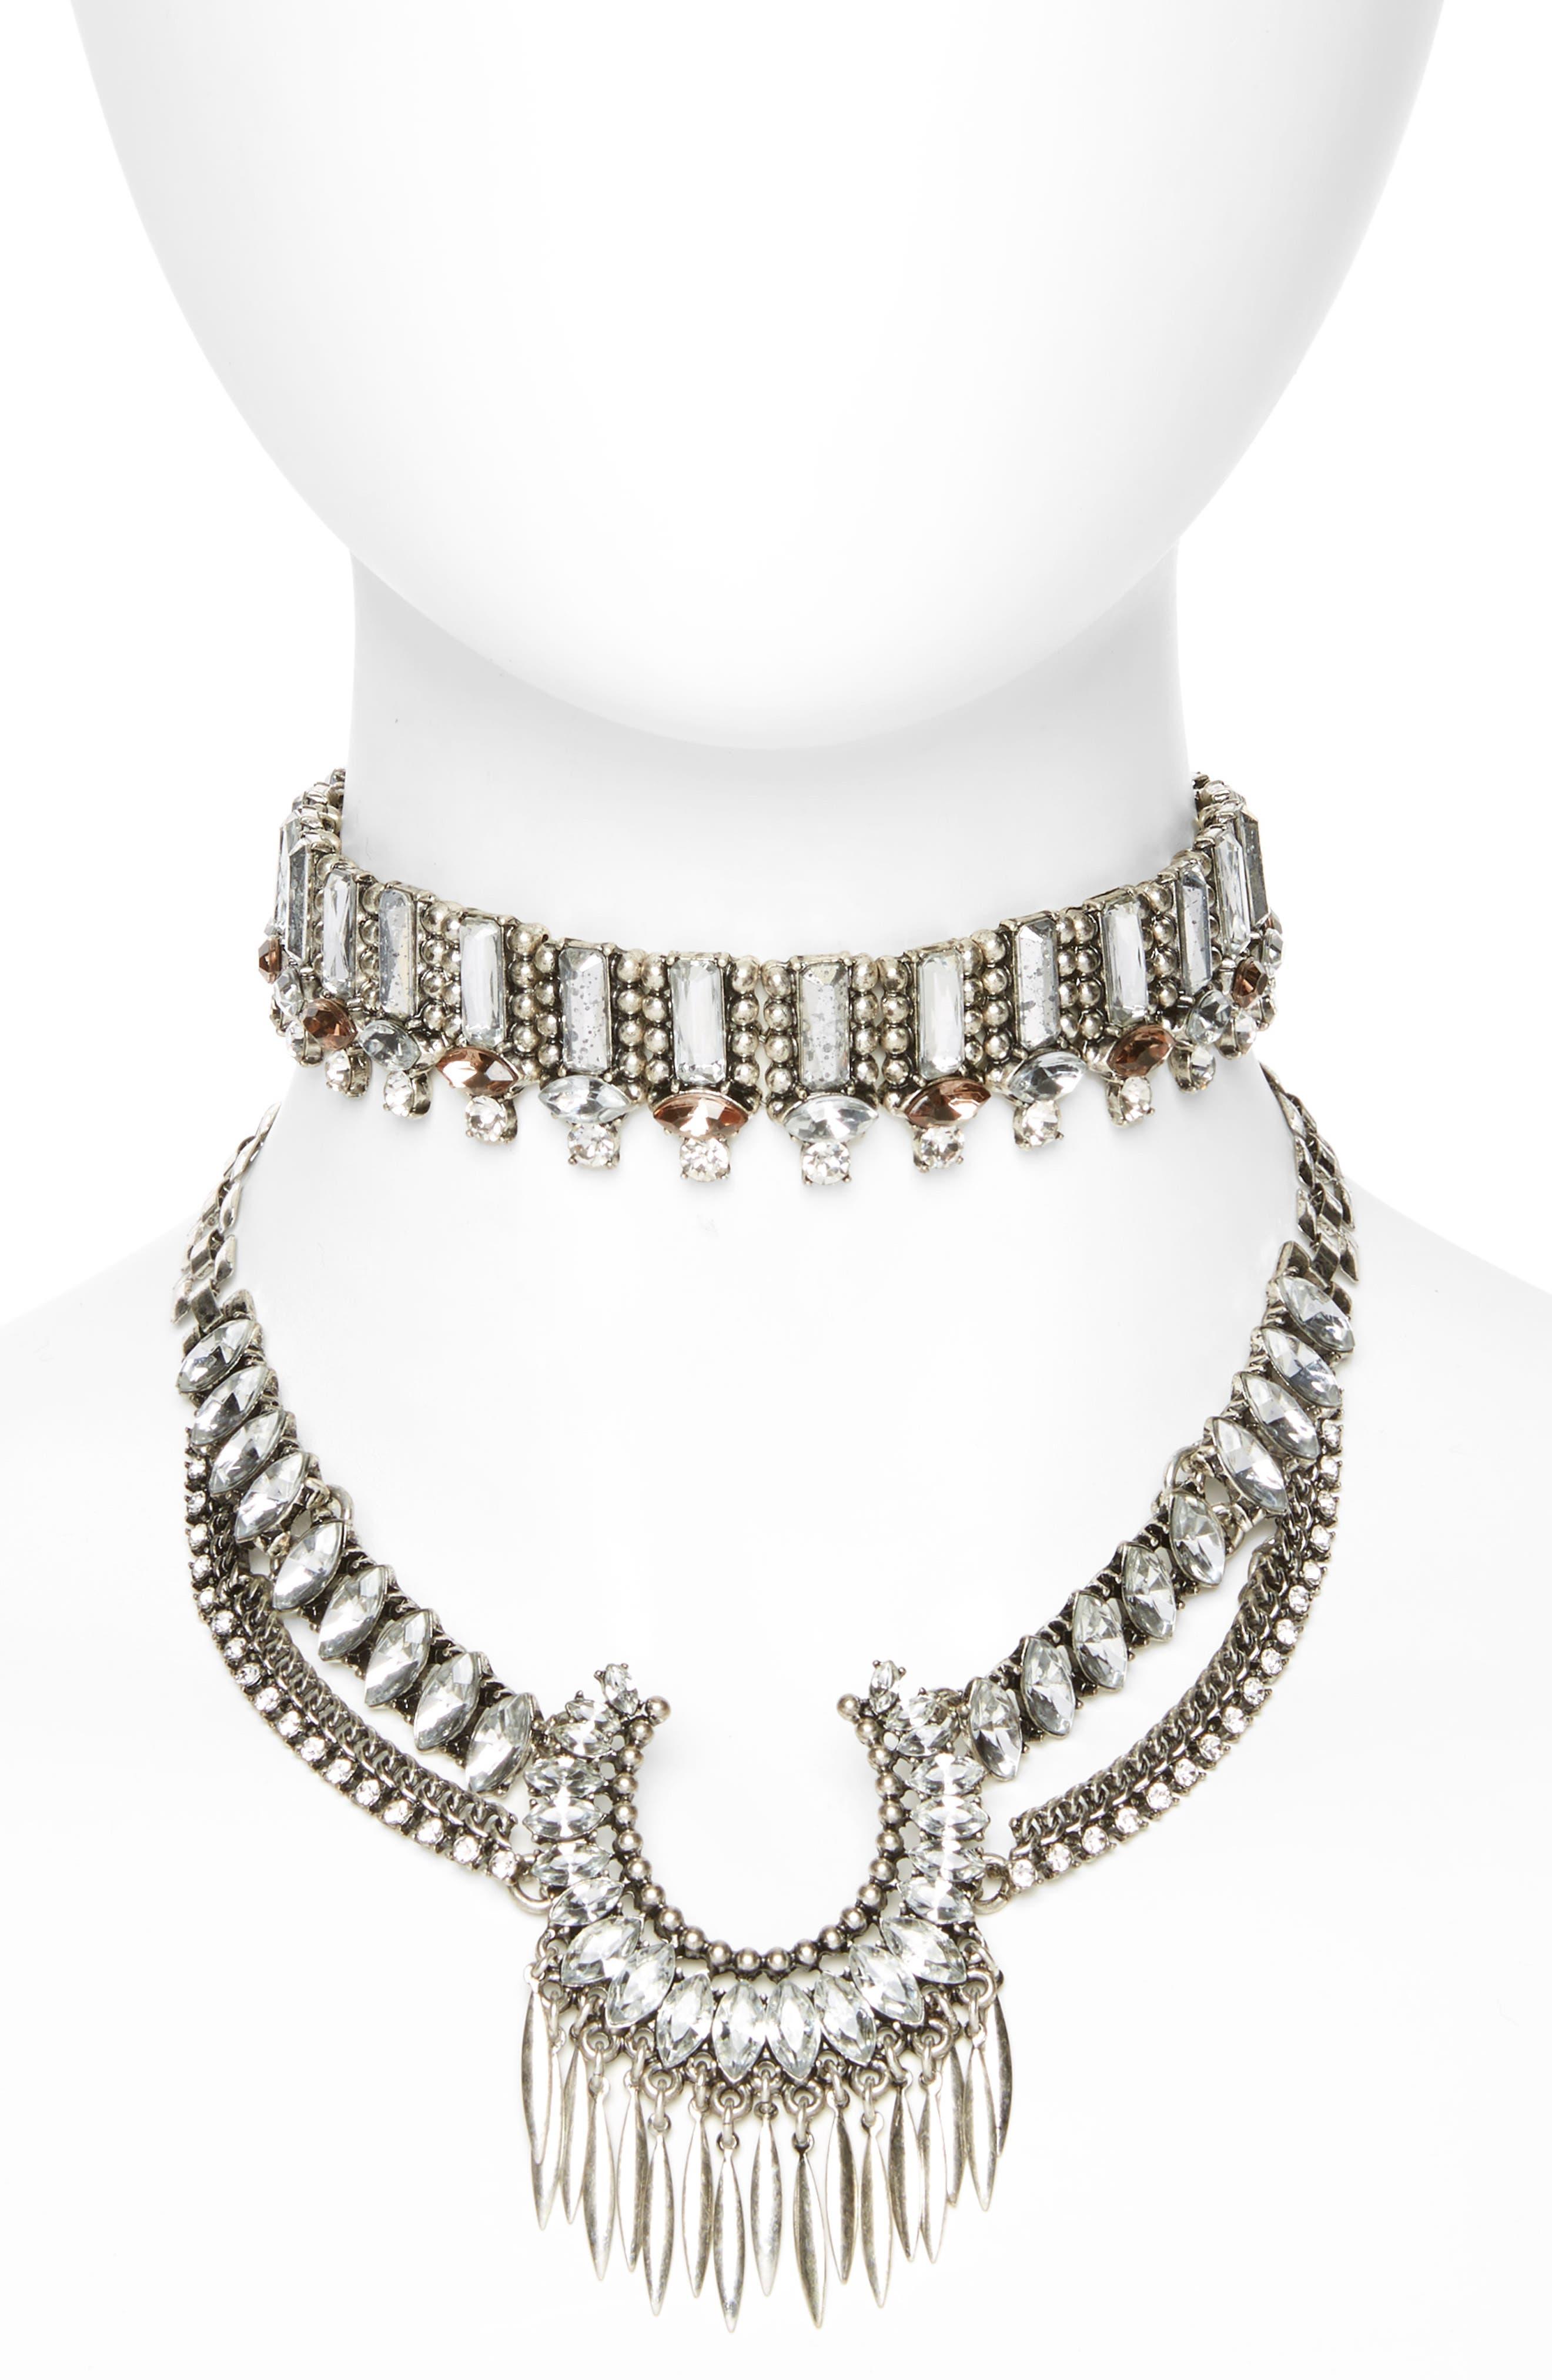 372b03b39 ... authentic pandora choker bib necklace cb7f4 3e917